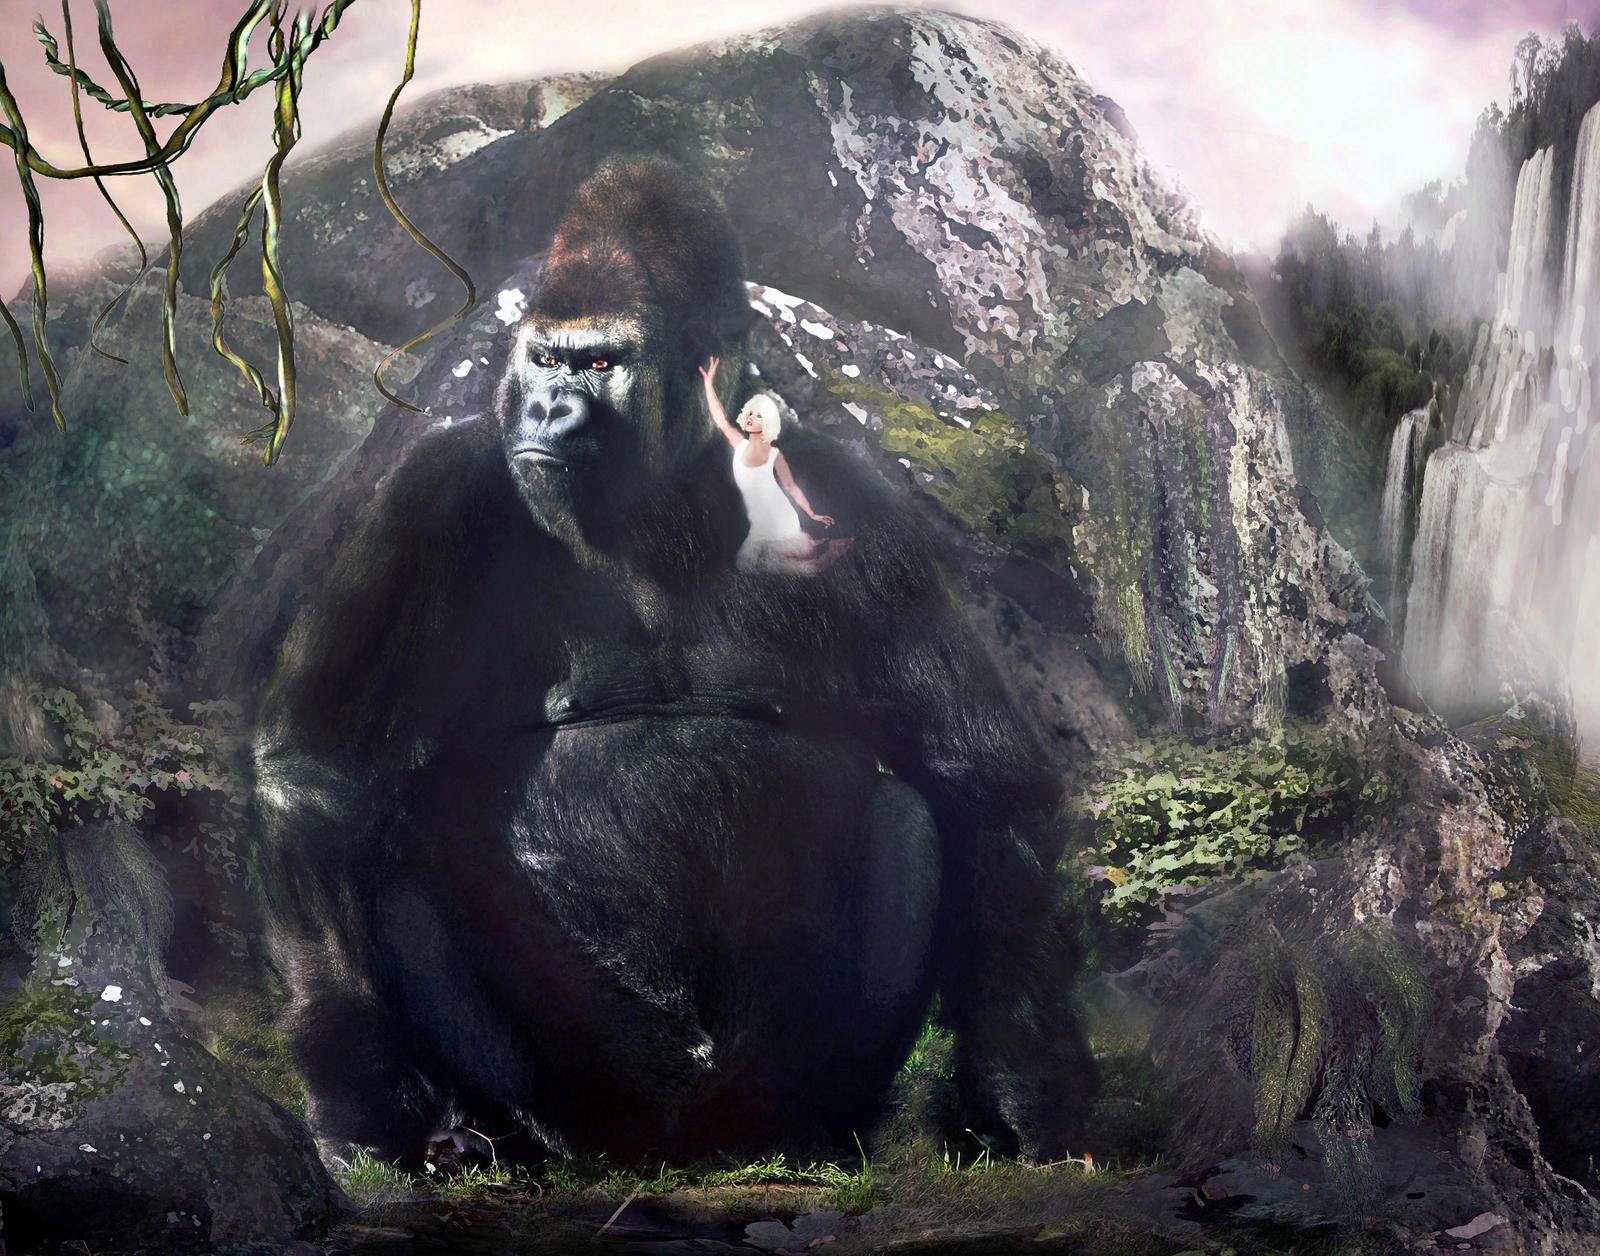 Kong plays Hard to Get by LindArtz